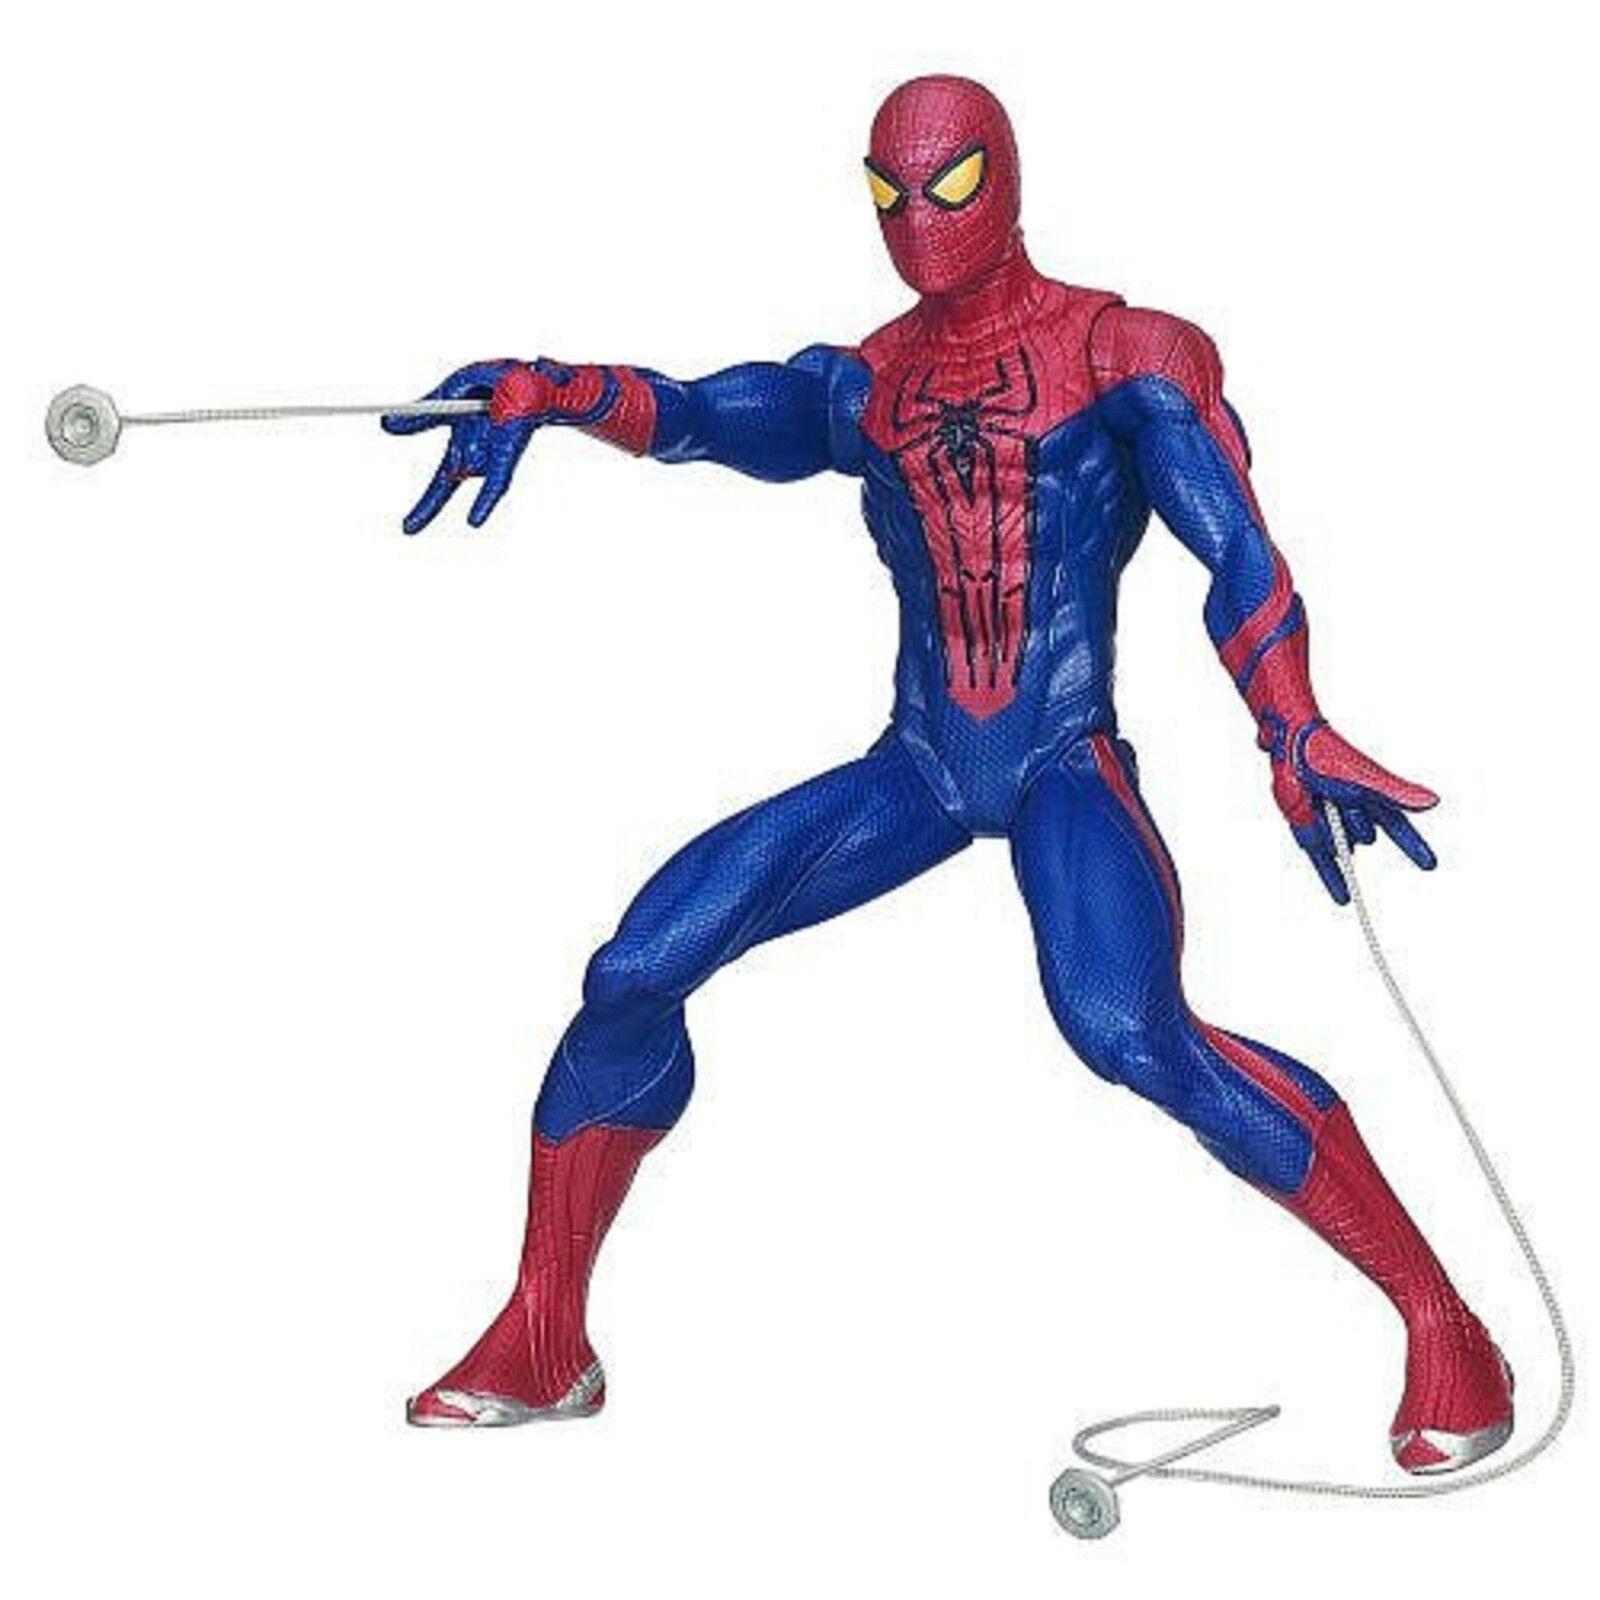 Mavel Avengers The Amazing Spiderman Web Shooting Hasbro Ages 4+ Spider Man Toy